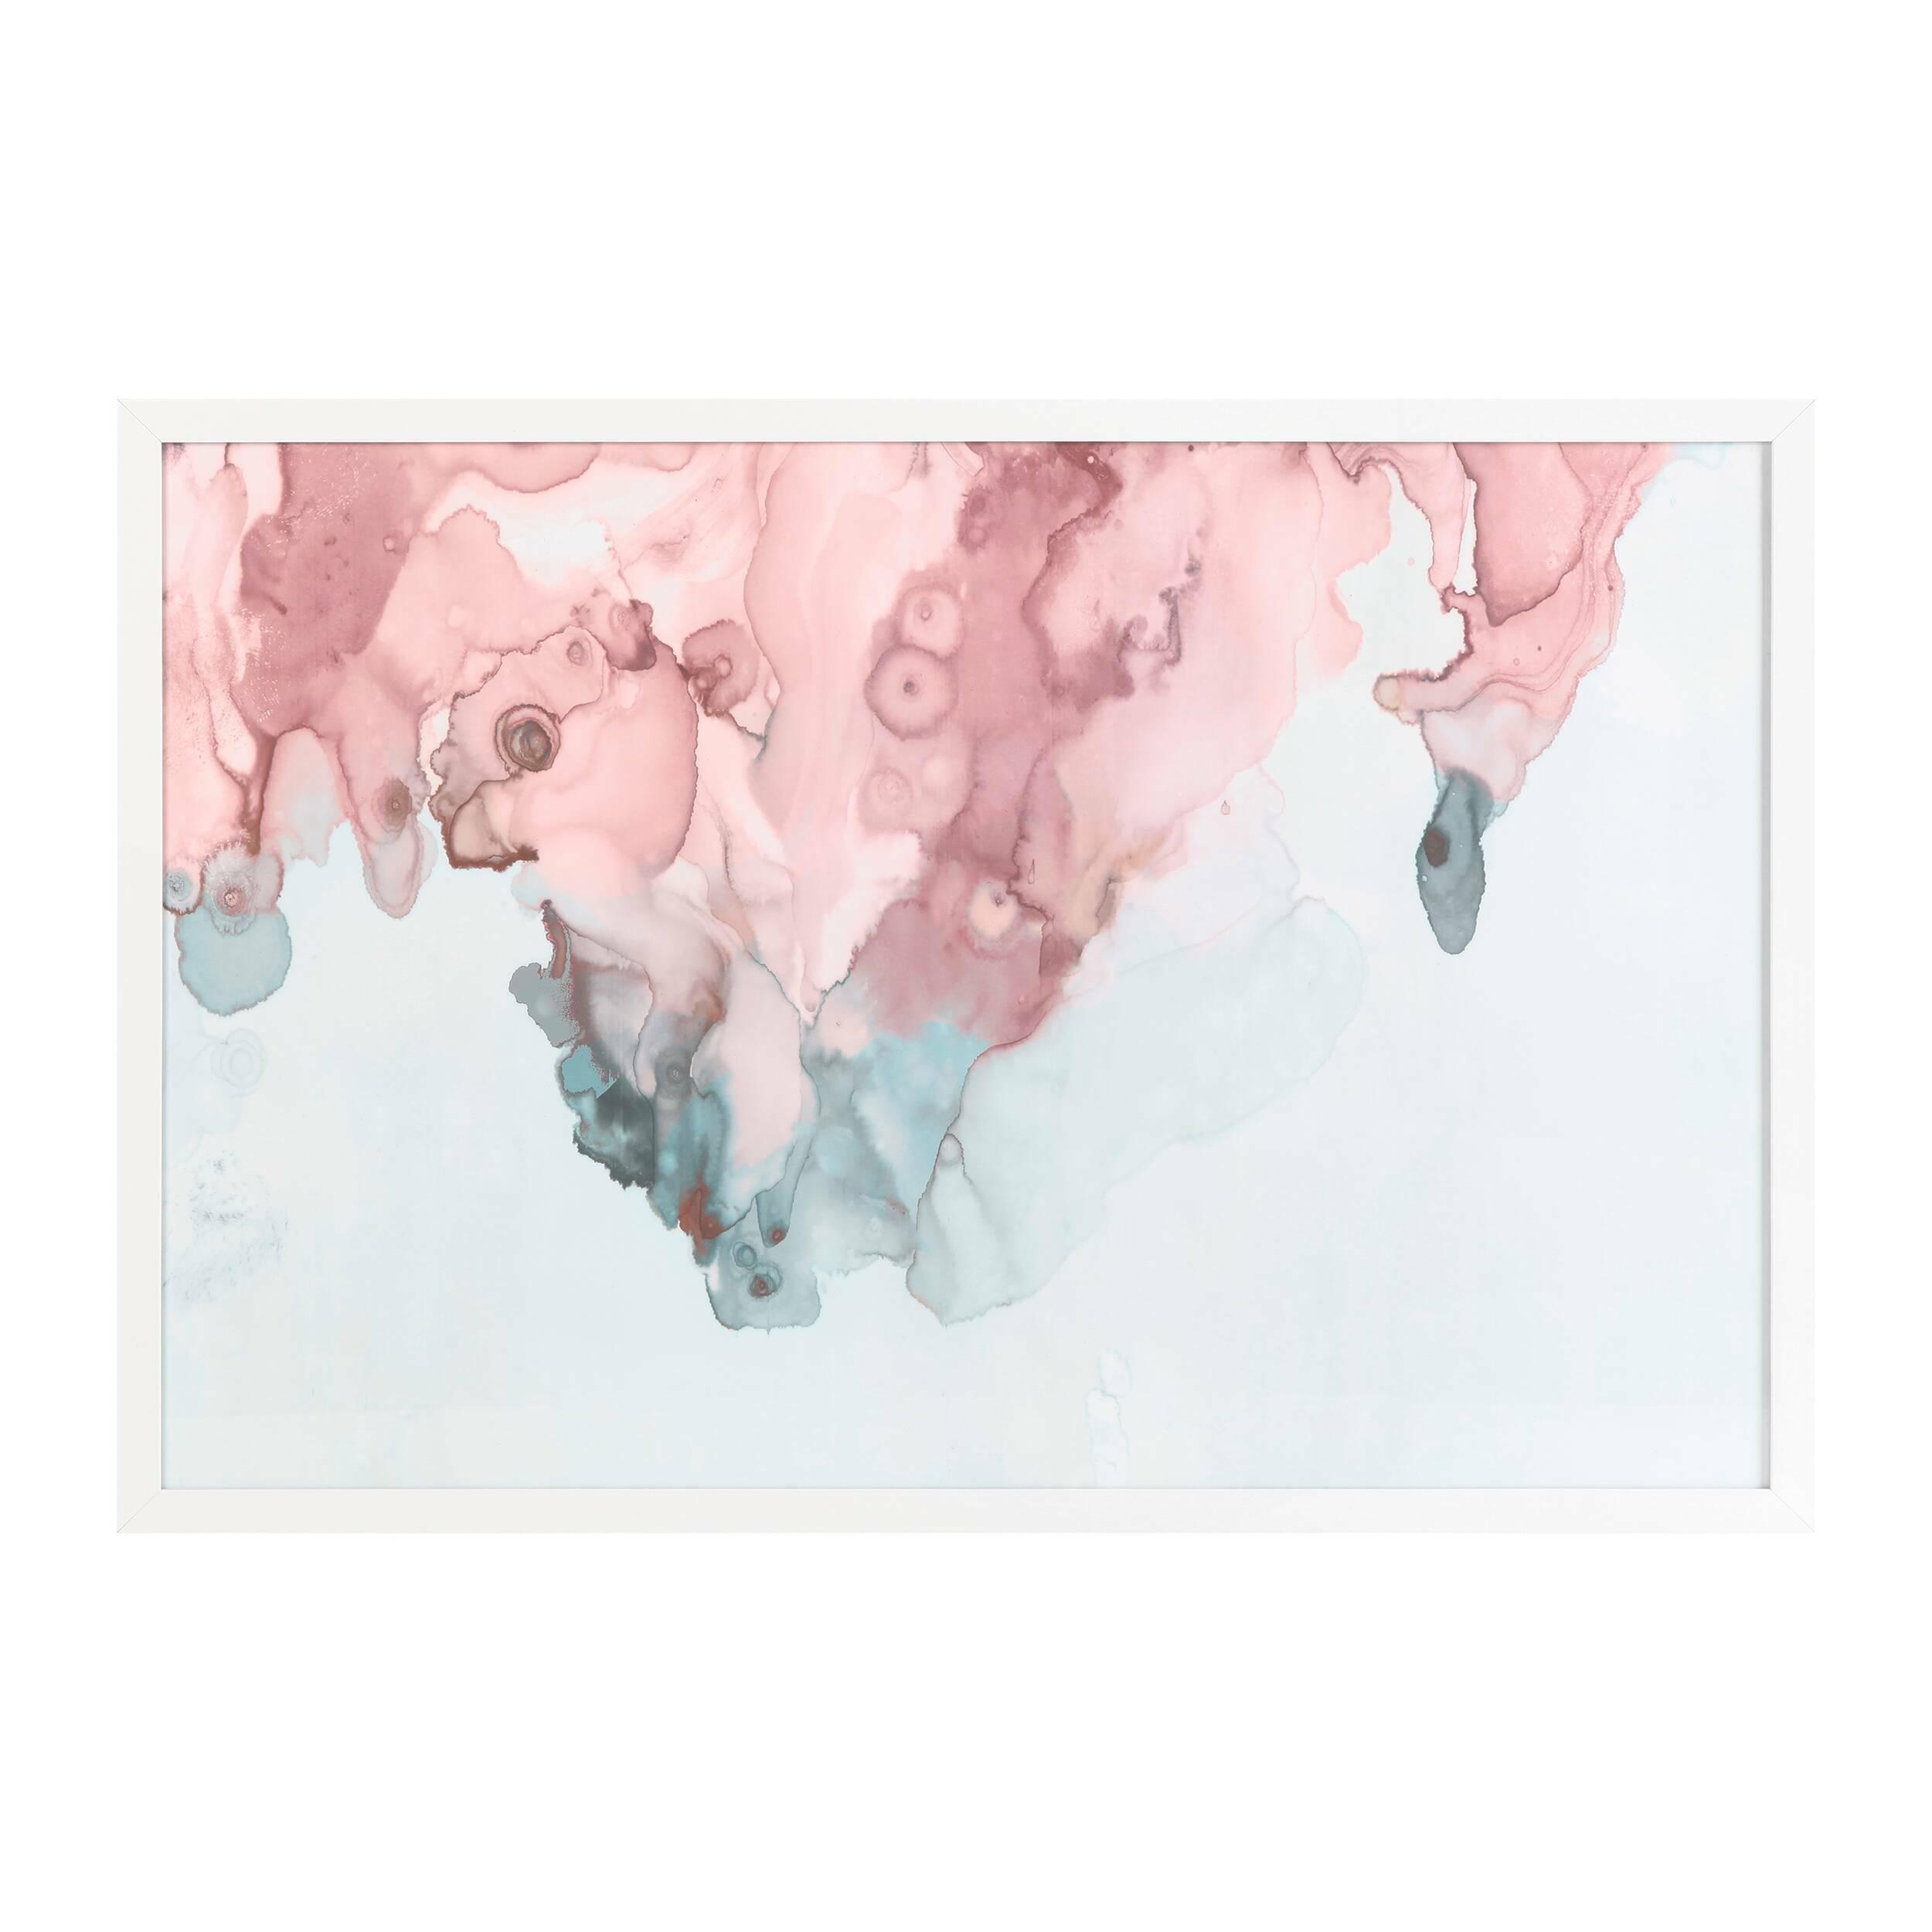 Постер Pink Marble the cosmo cosmo 30